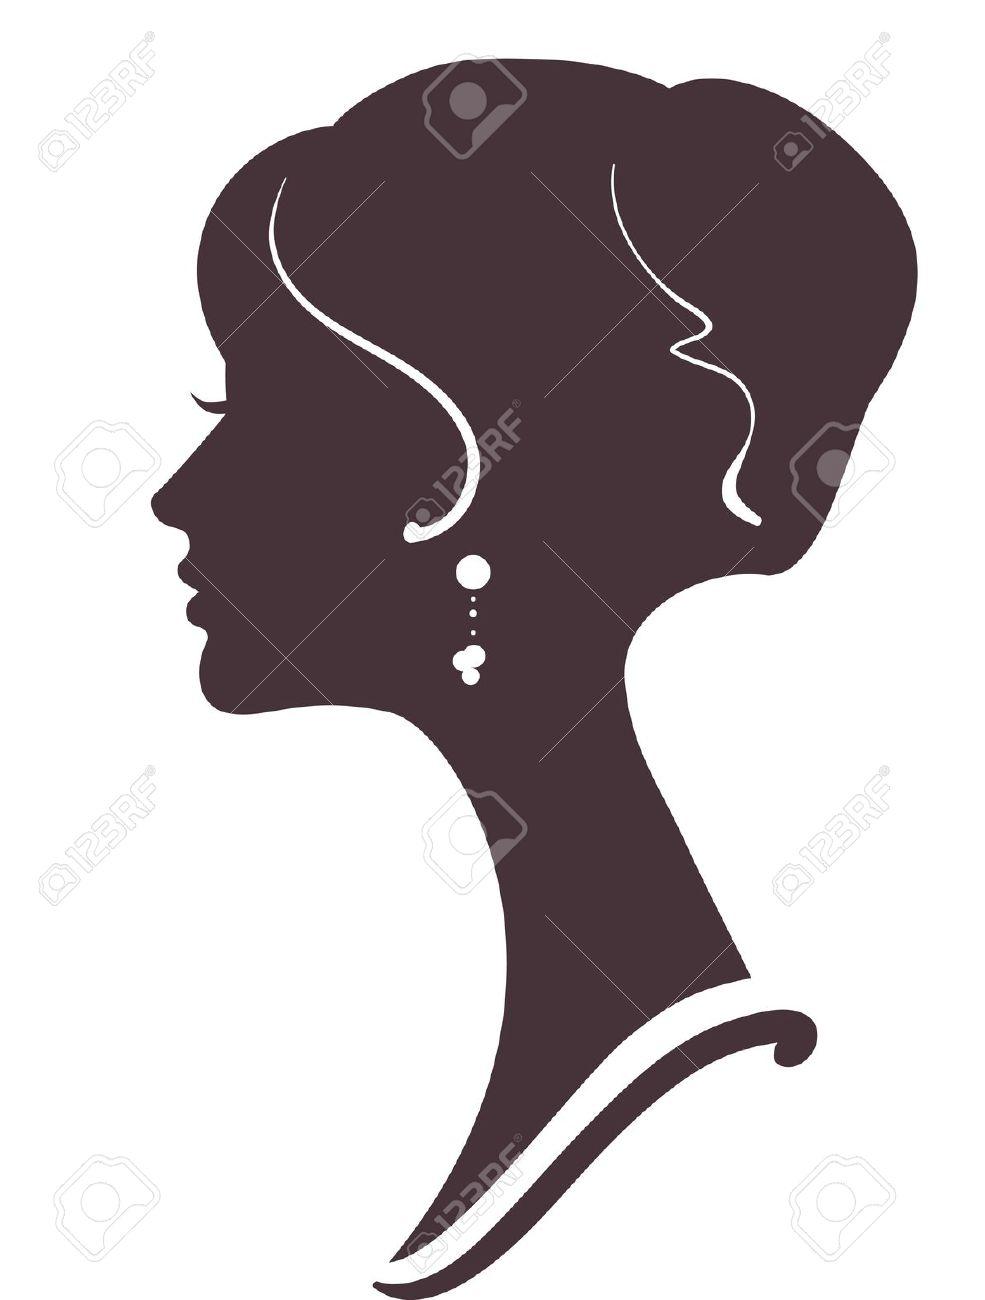 Drawn profile silhouette Vector Silhouettes silhouette face Google